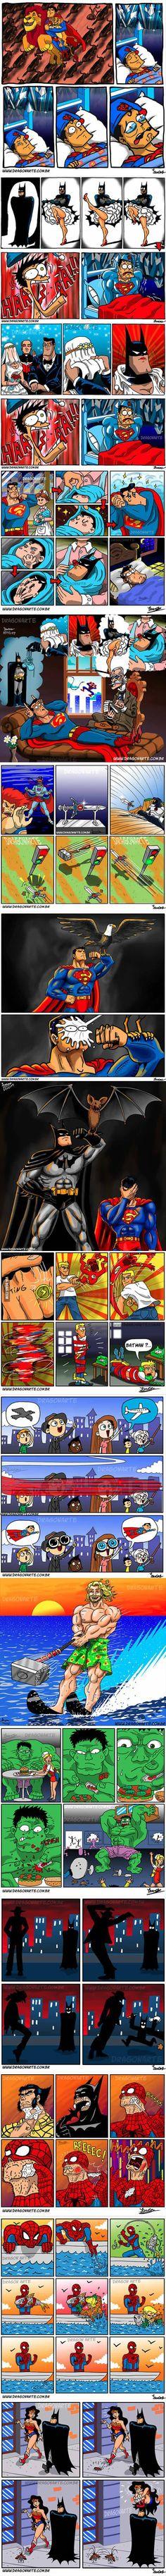 The Funniest Superhero Comics Collection